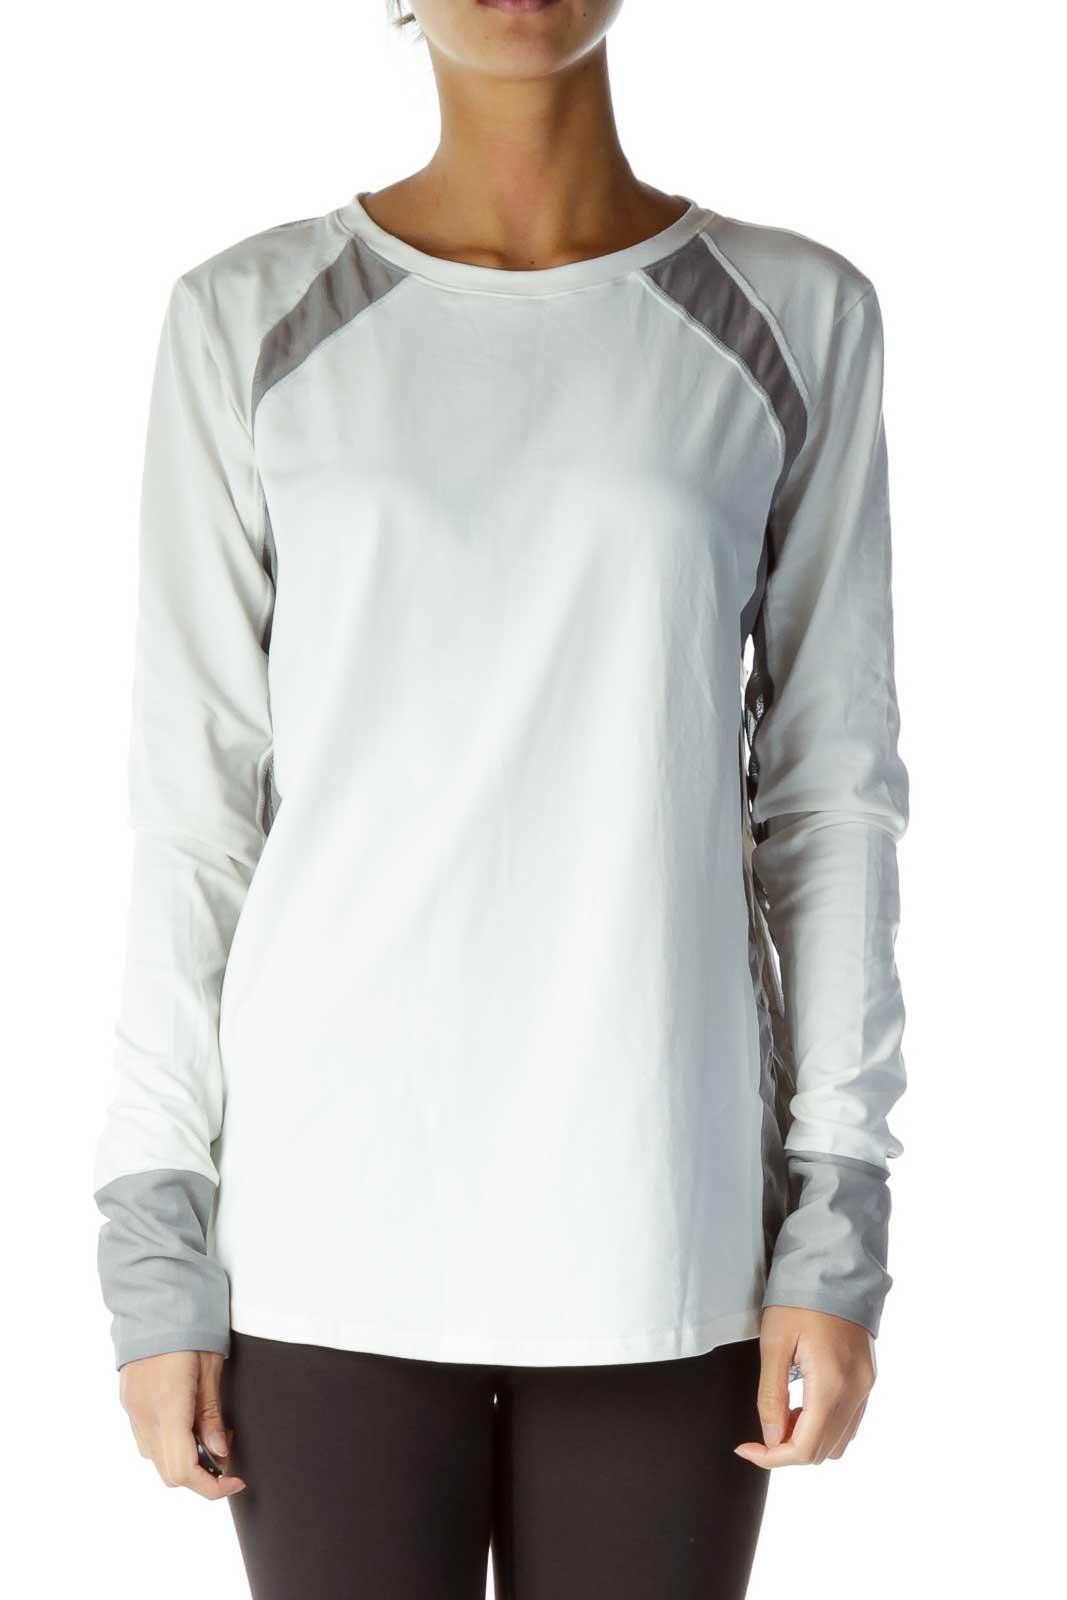 White Gray See-Through Sweatshirt Front